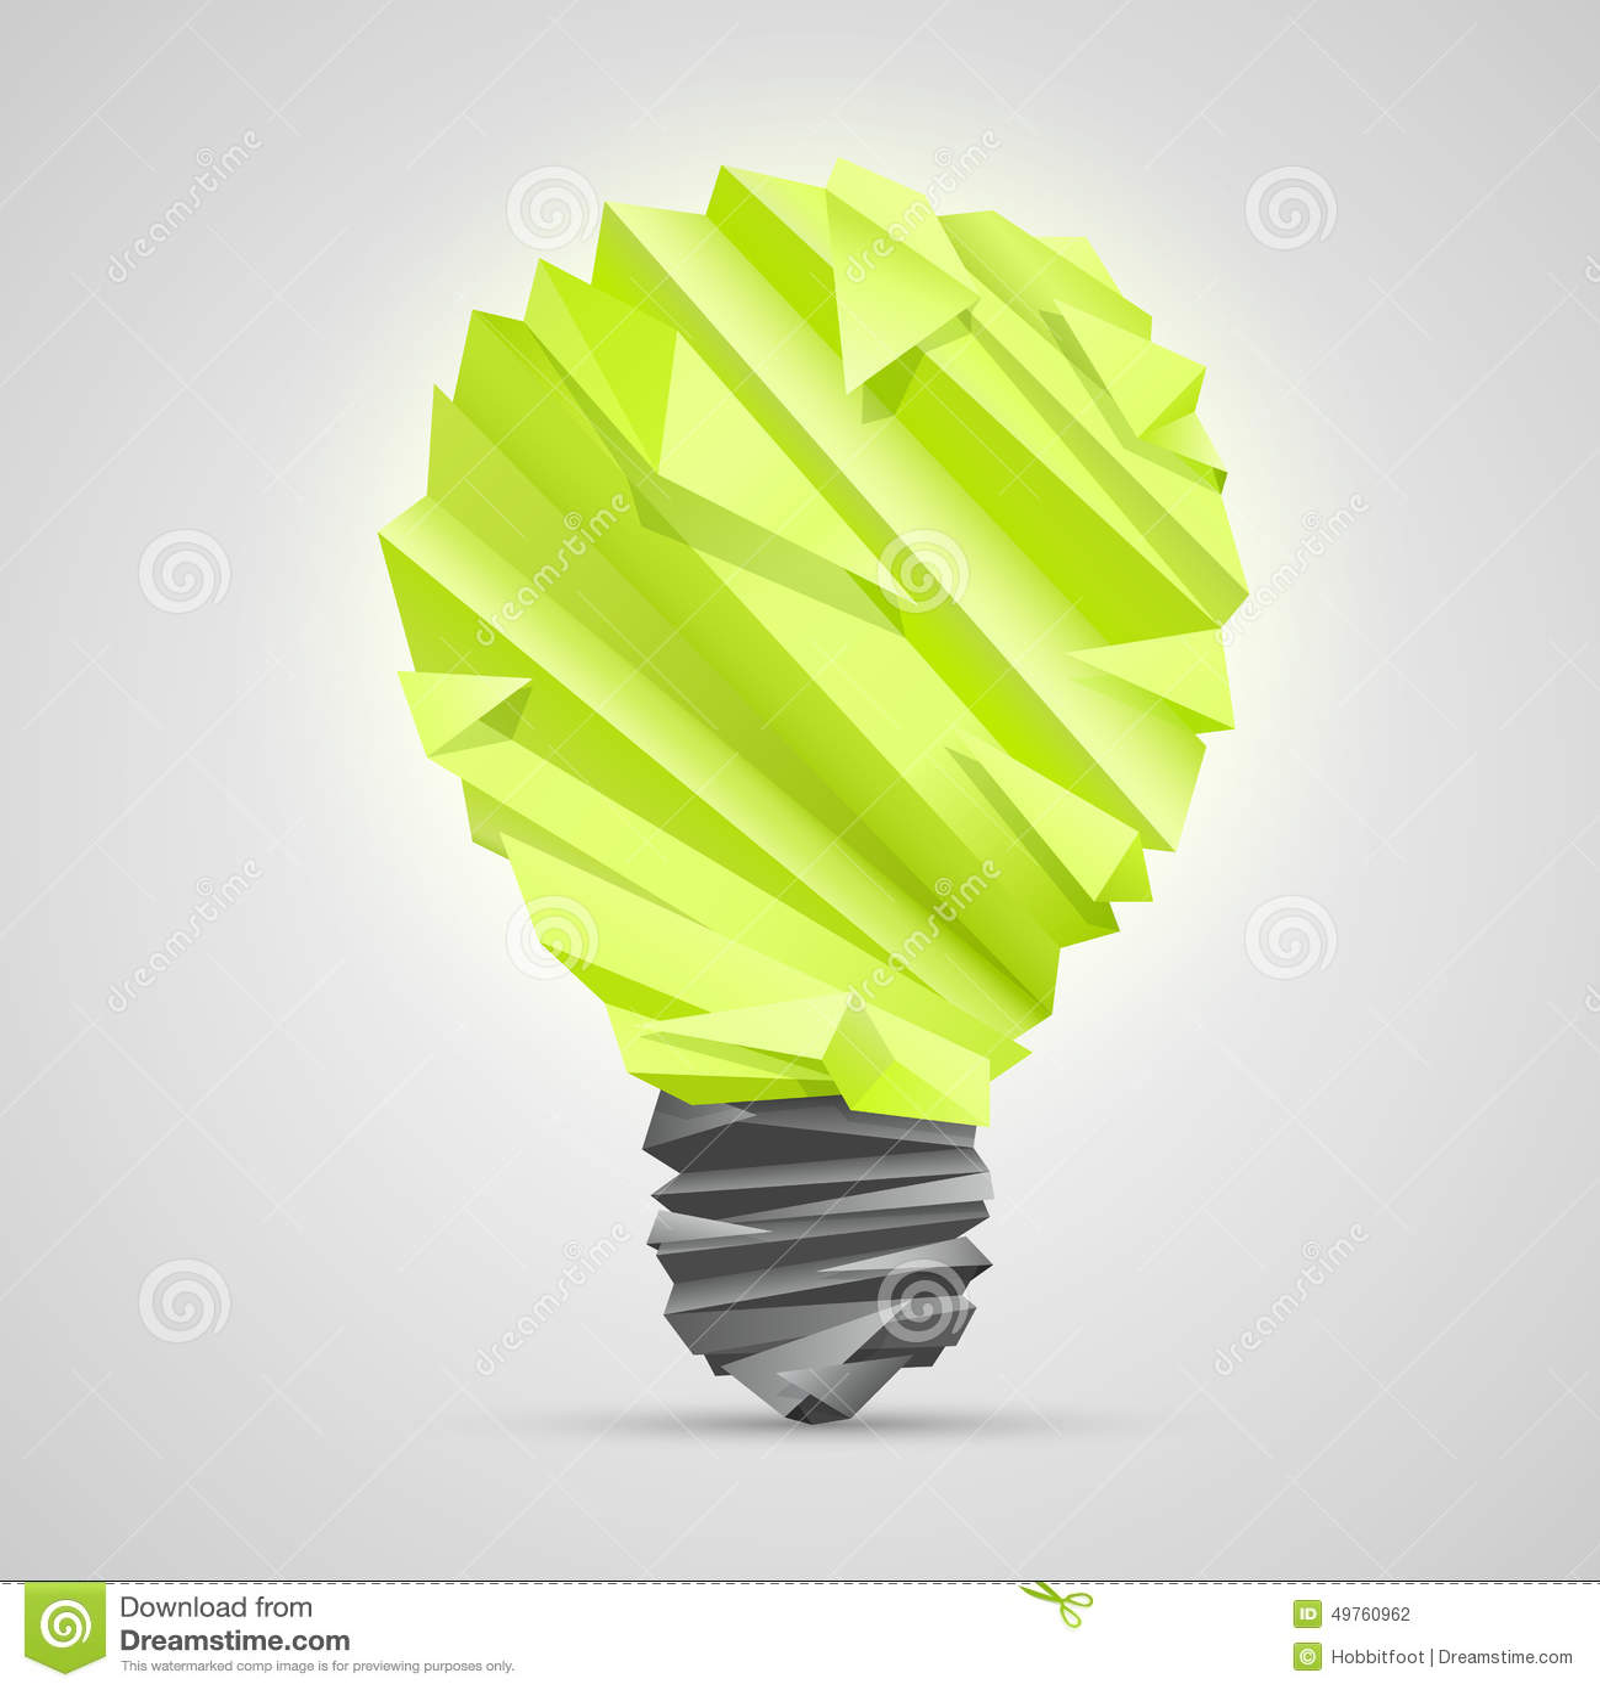 id e cr ative de lampe d 39 origami illustration de vecteur. Black Bedroom Furniture Sets. Home Design Ideas